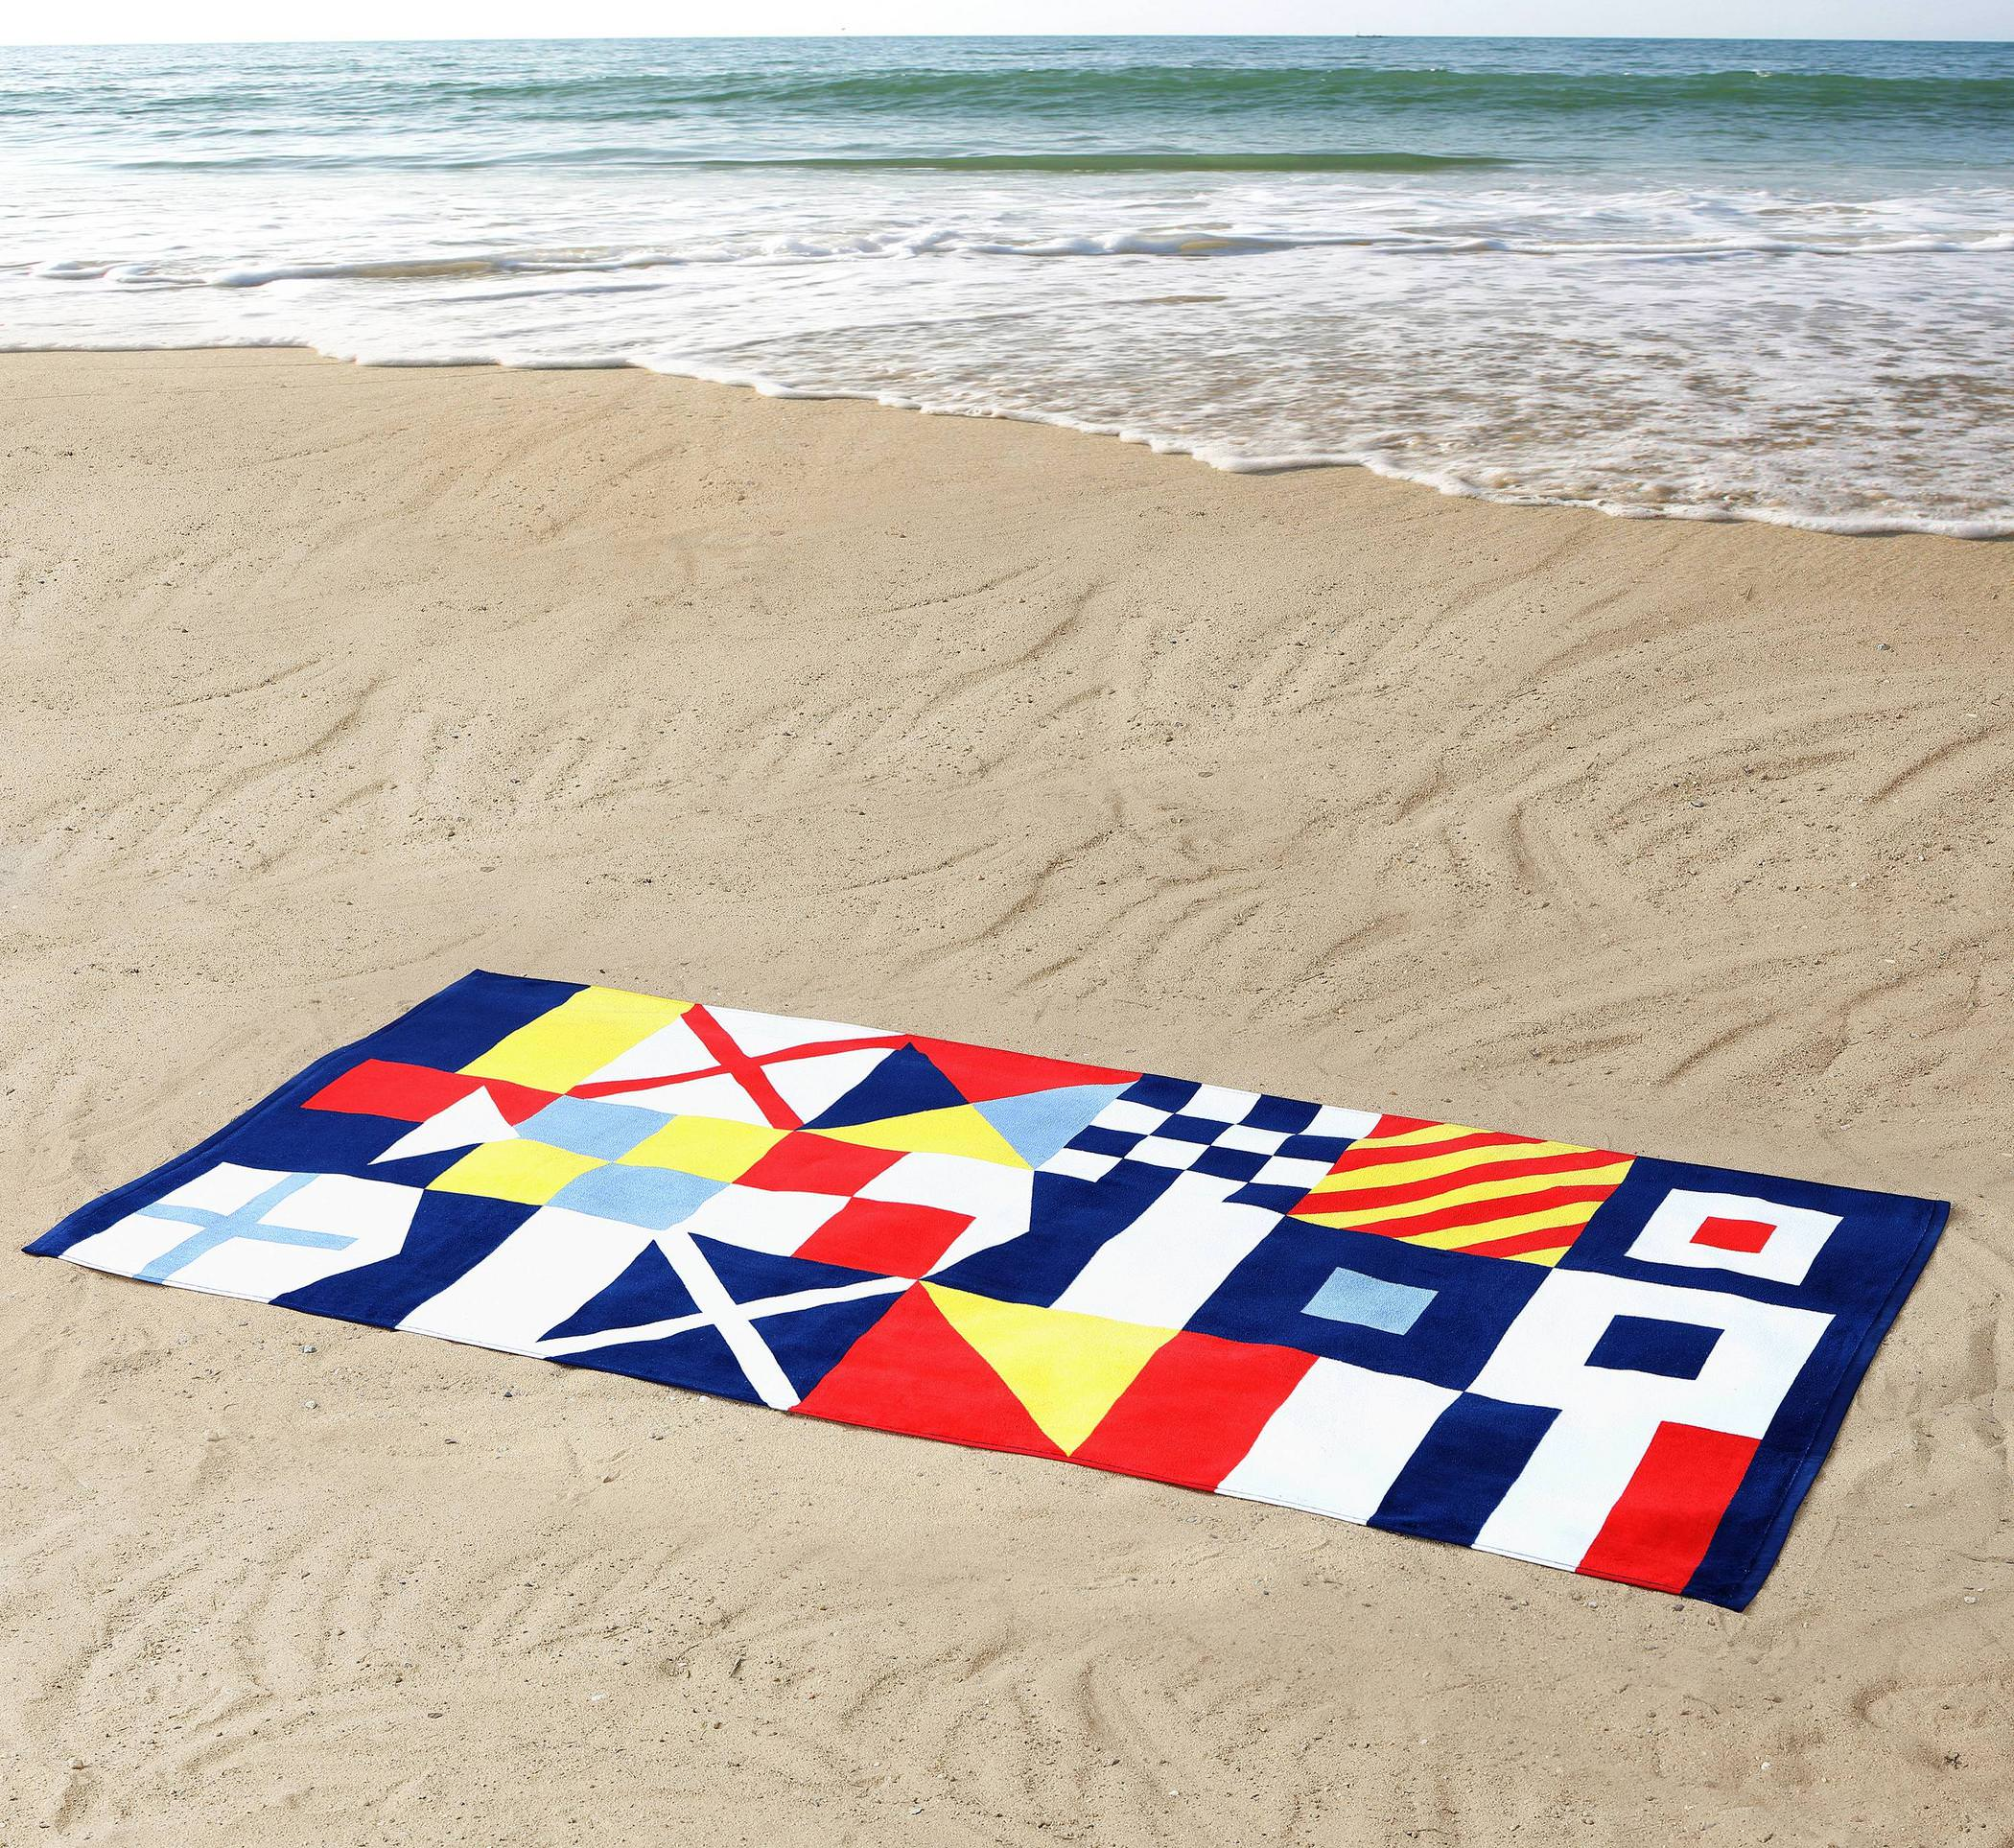 VCNY Home Seedling By Thomas Paul: 100% Nautical Cotton Beach Towel